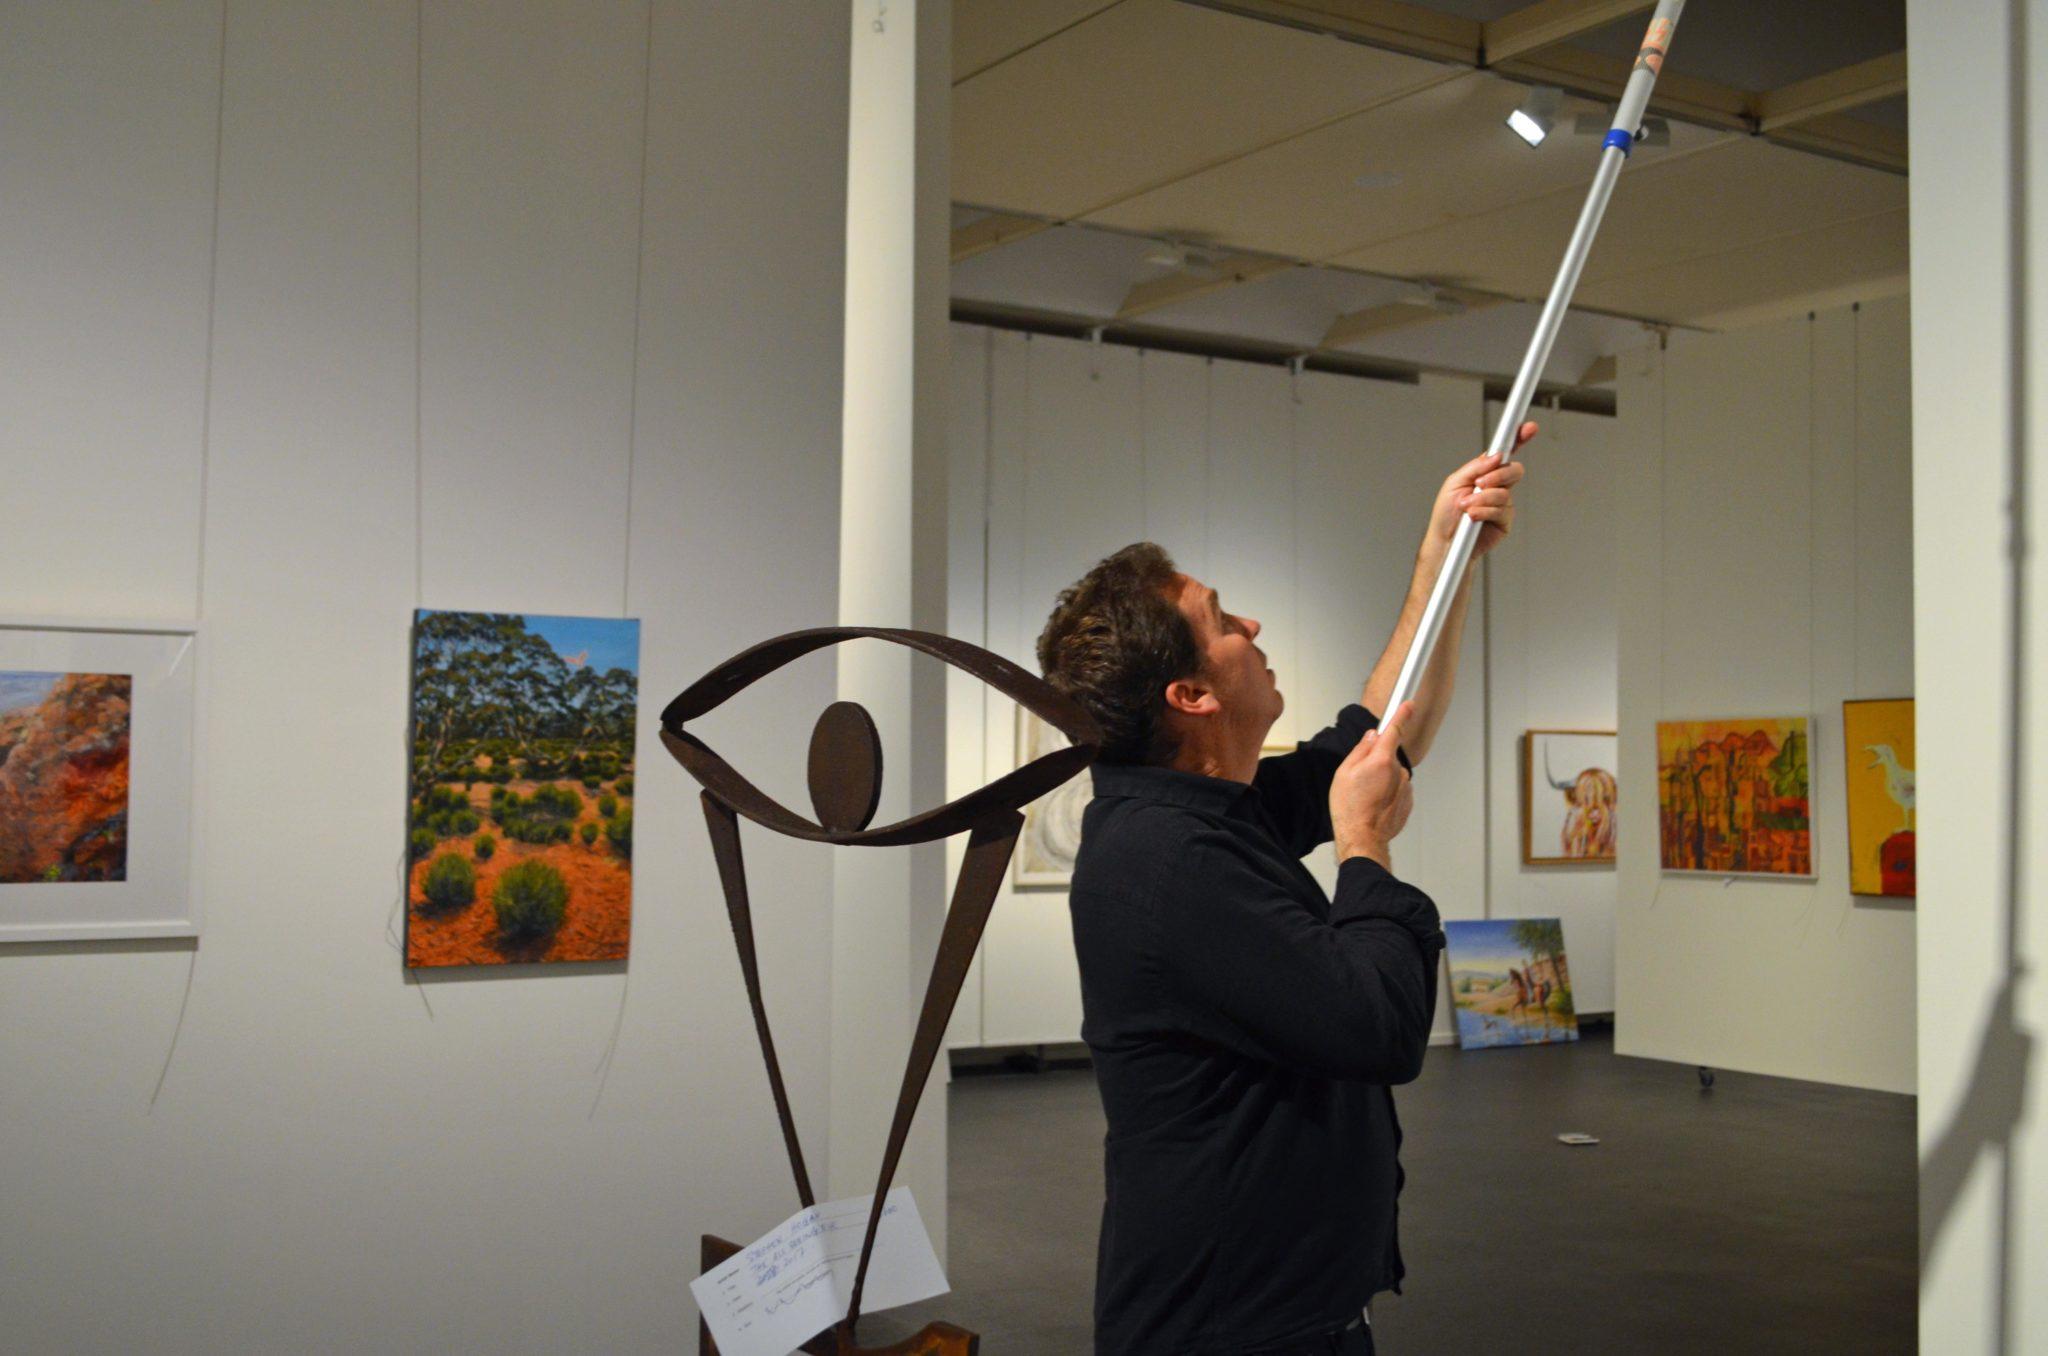 Gallery director Brad Hammond installs last year's Here Now exhibition